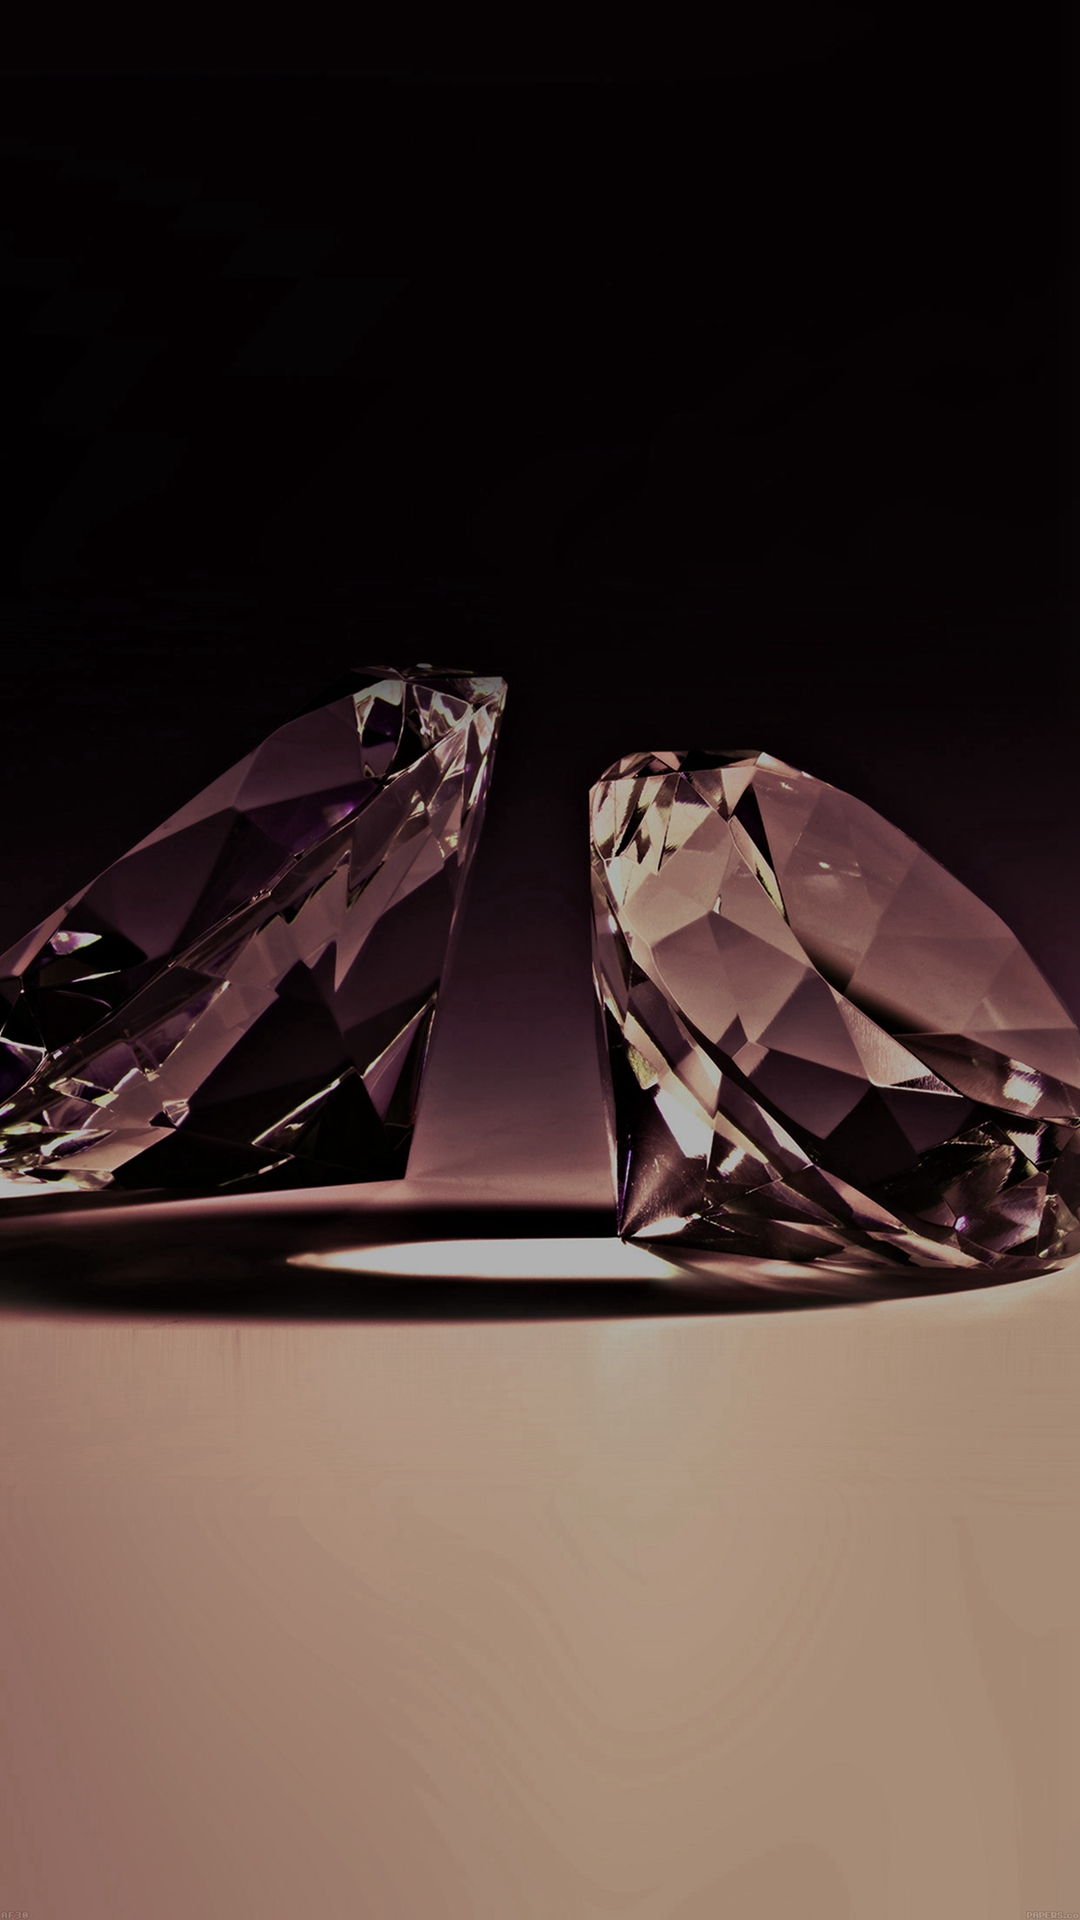 Black Diamond Iphone Wallpaper